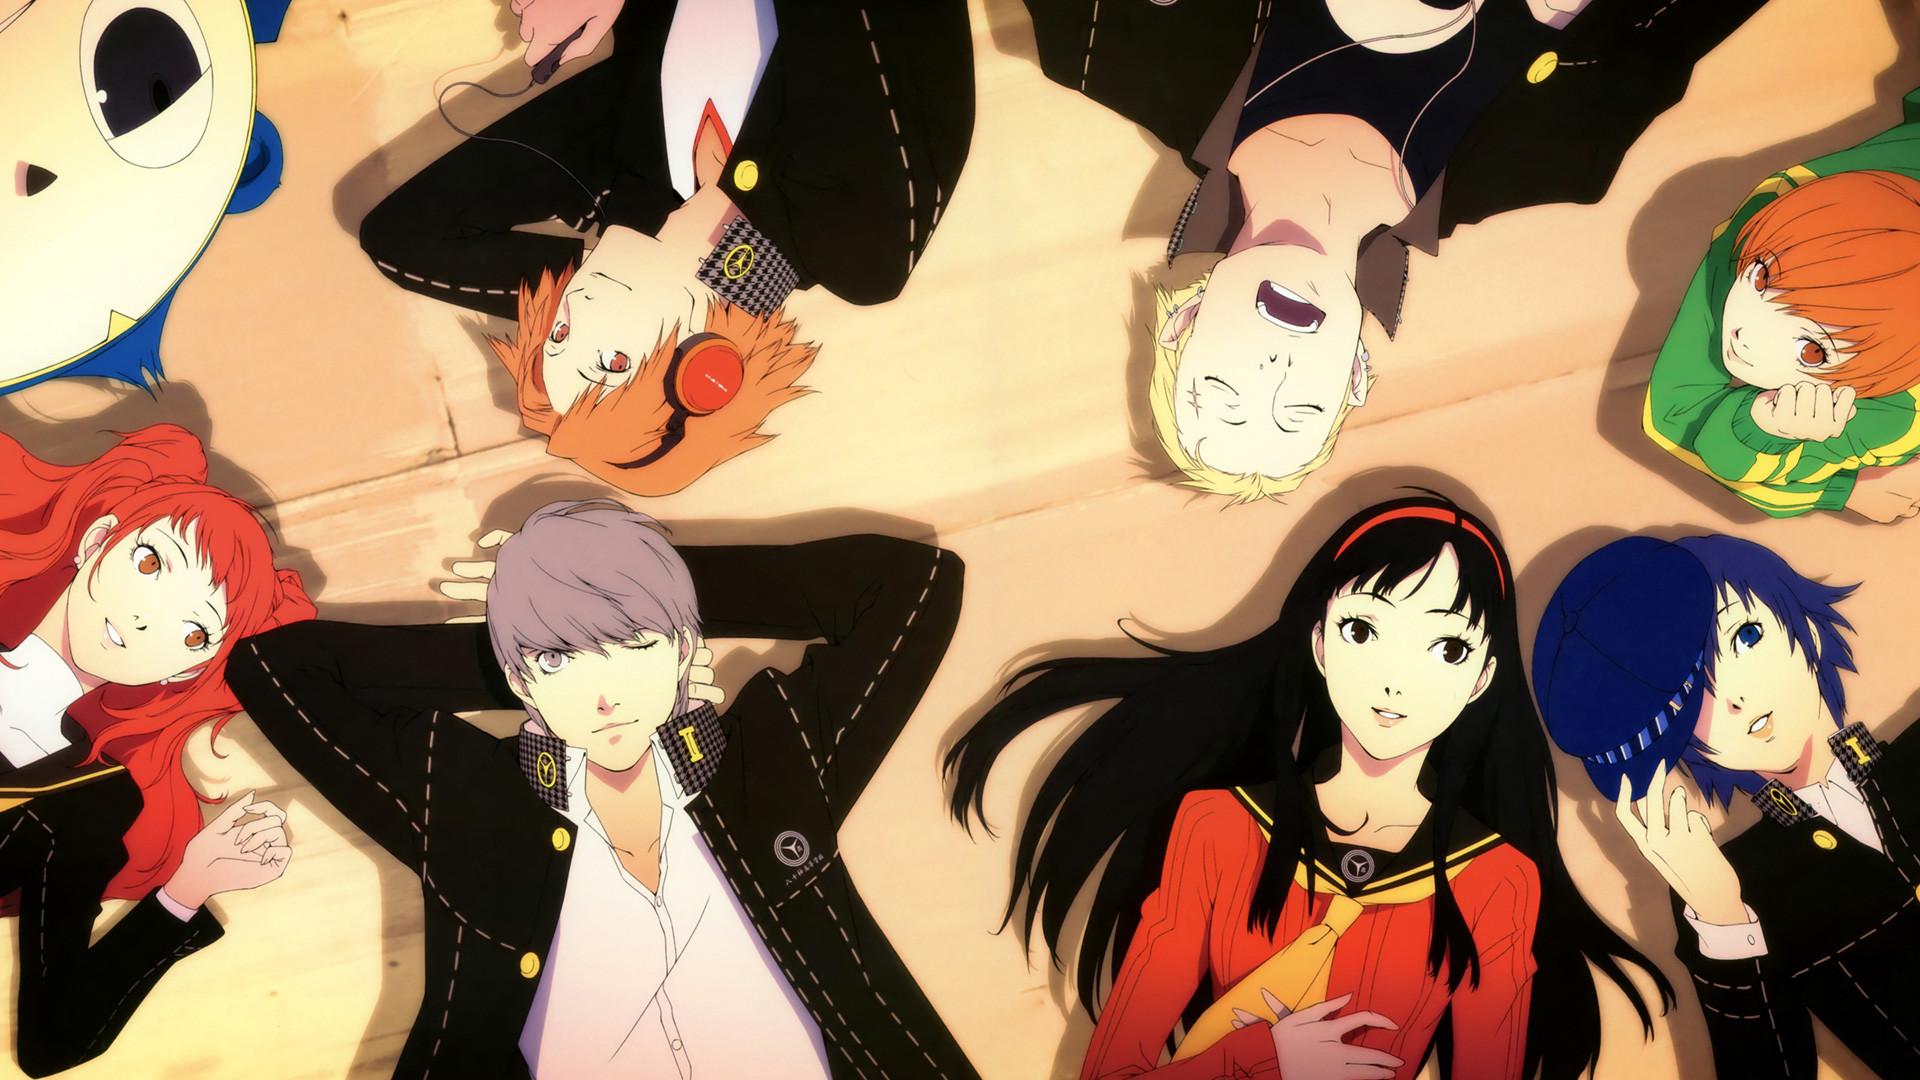 Video Game – Persona 4 Wallpaper